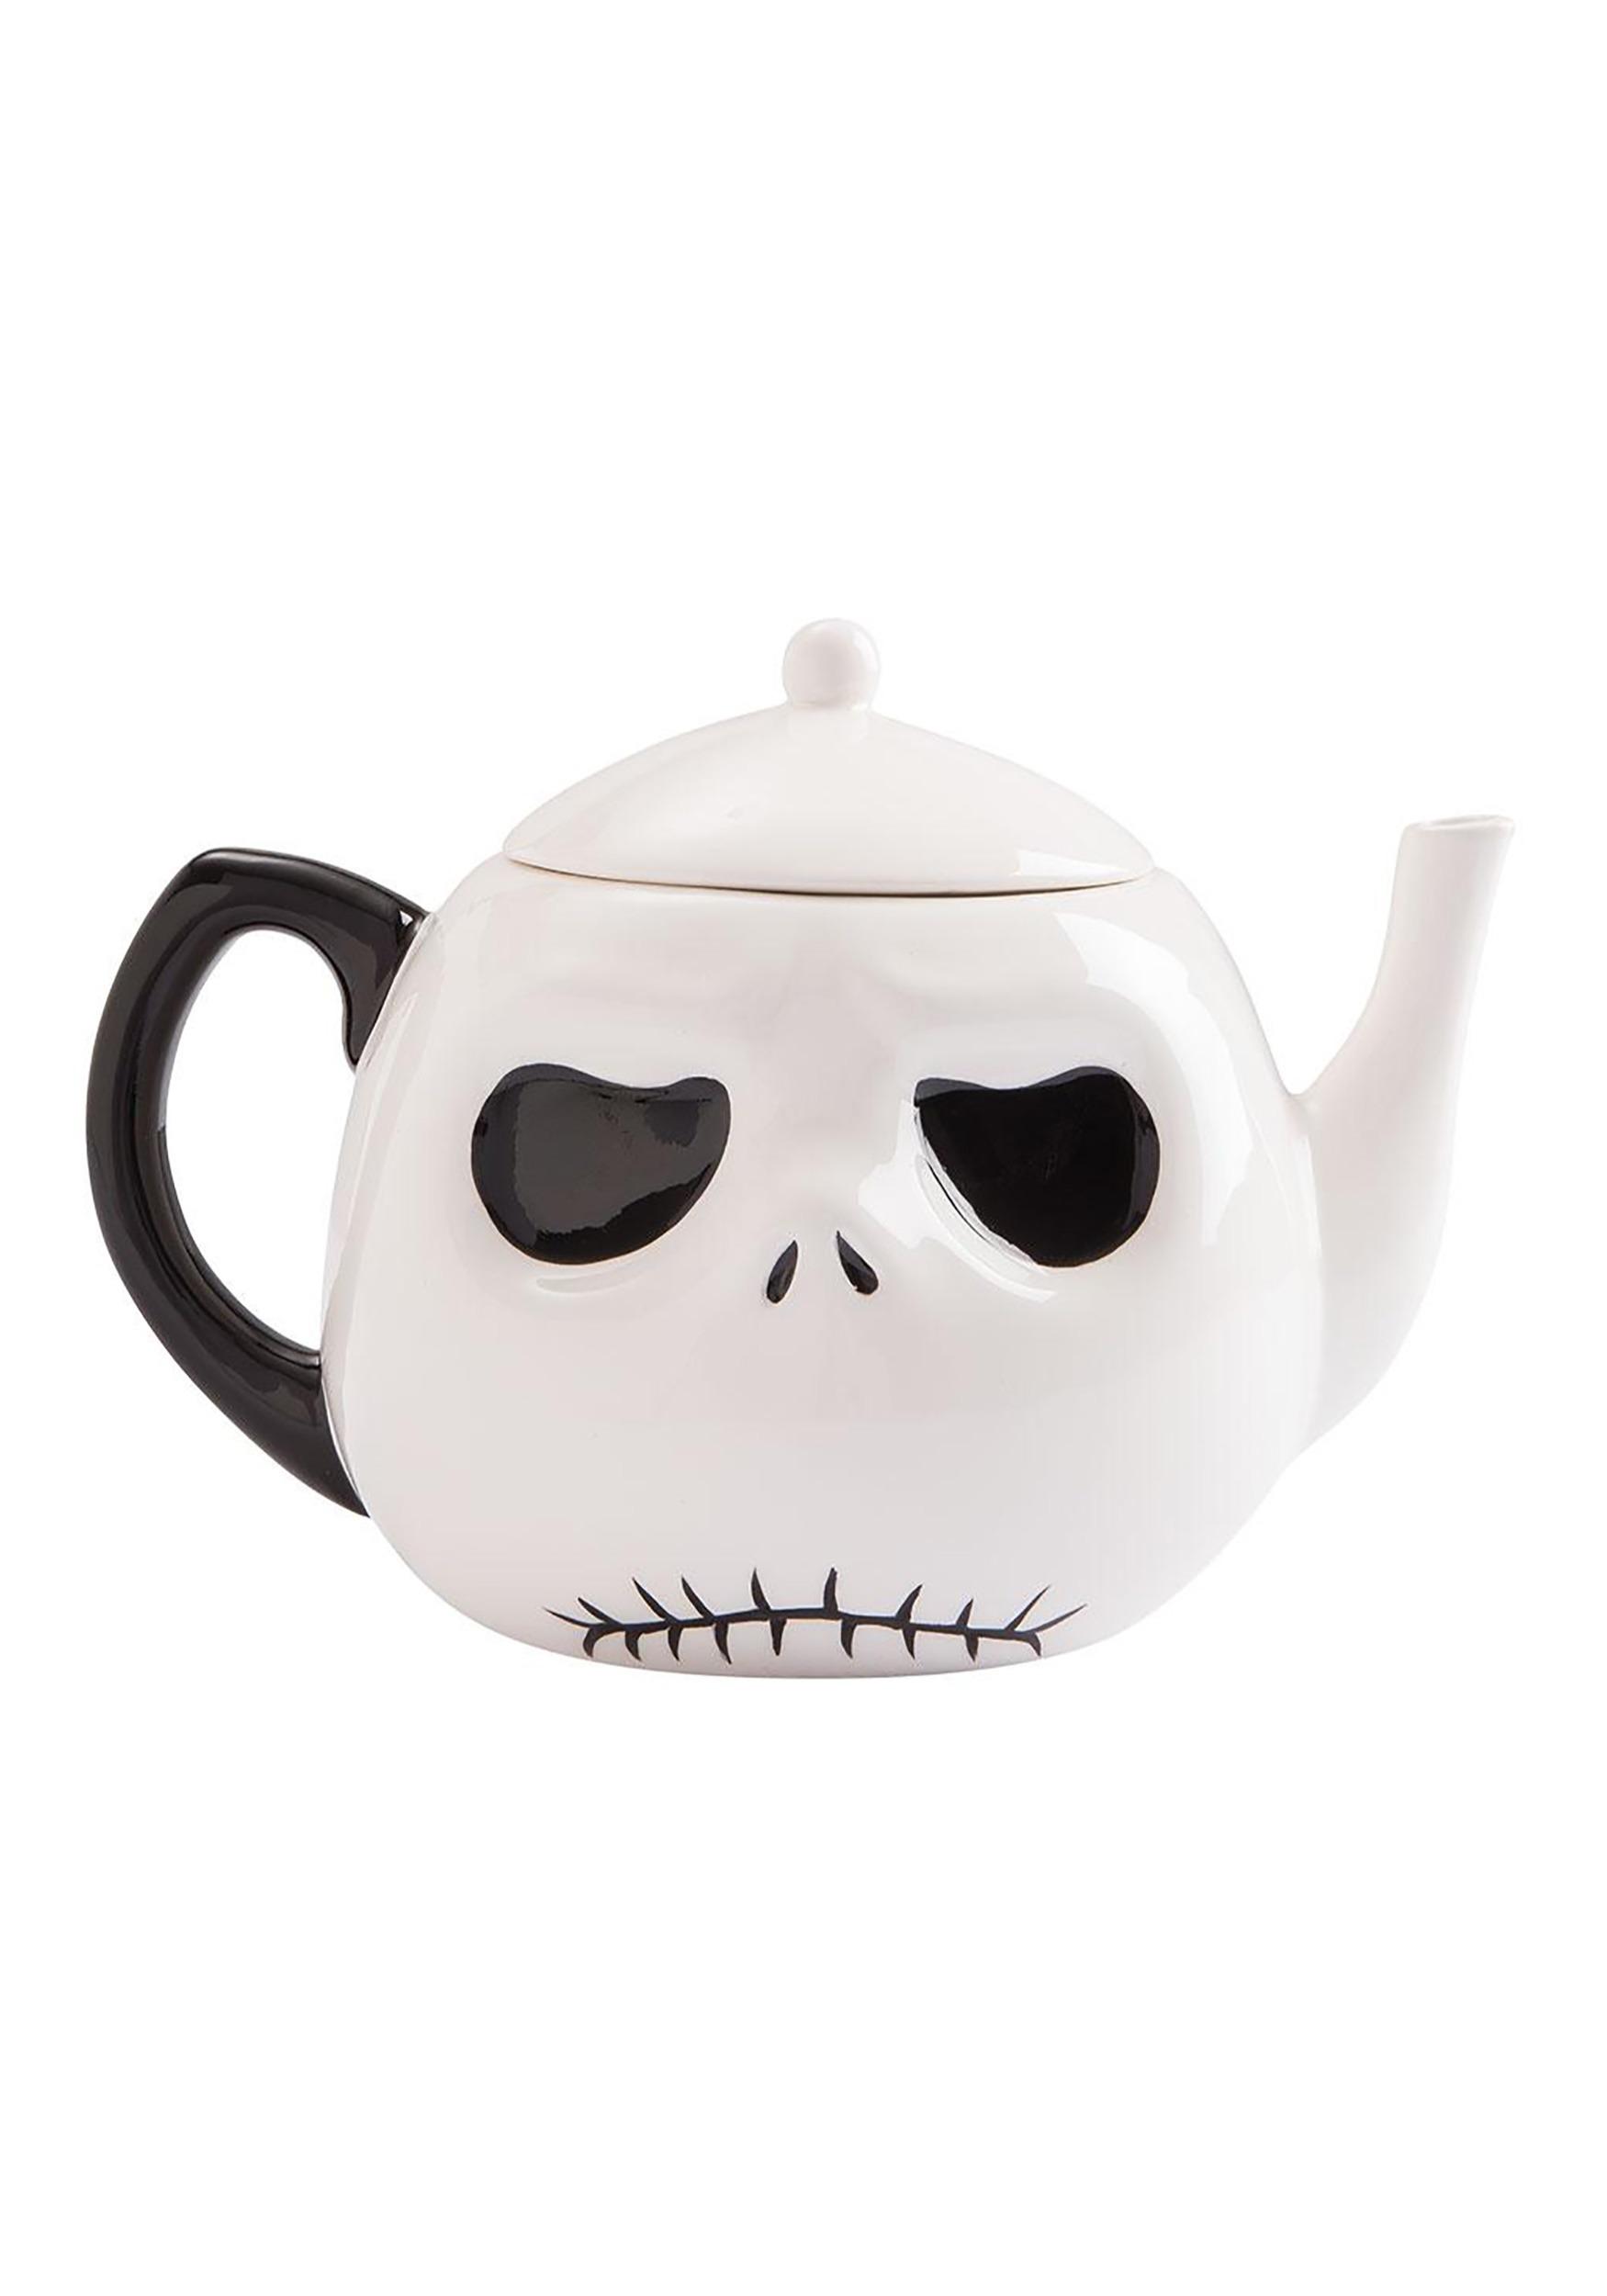 Jack Skellington Nightmare Before Christmas Ceramic Teapot